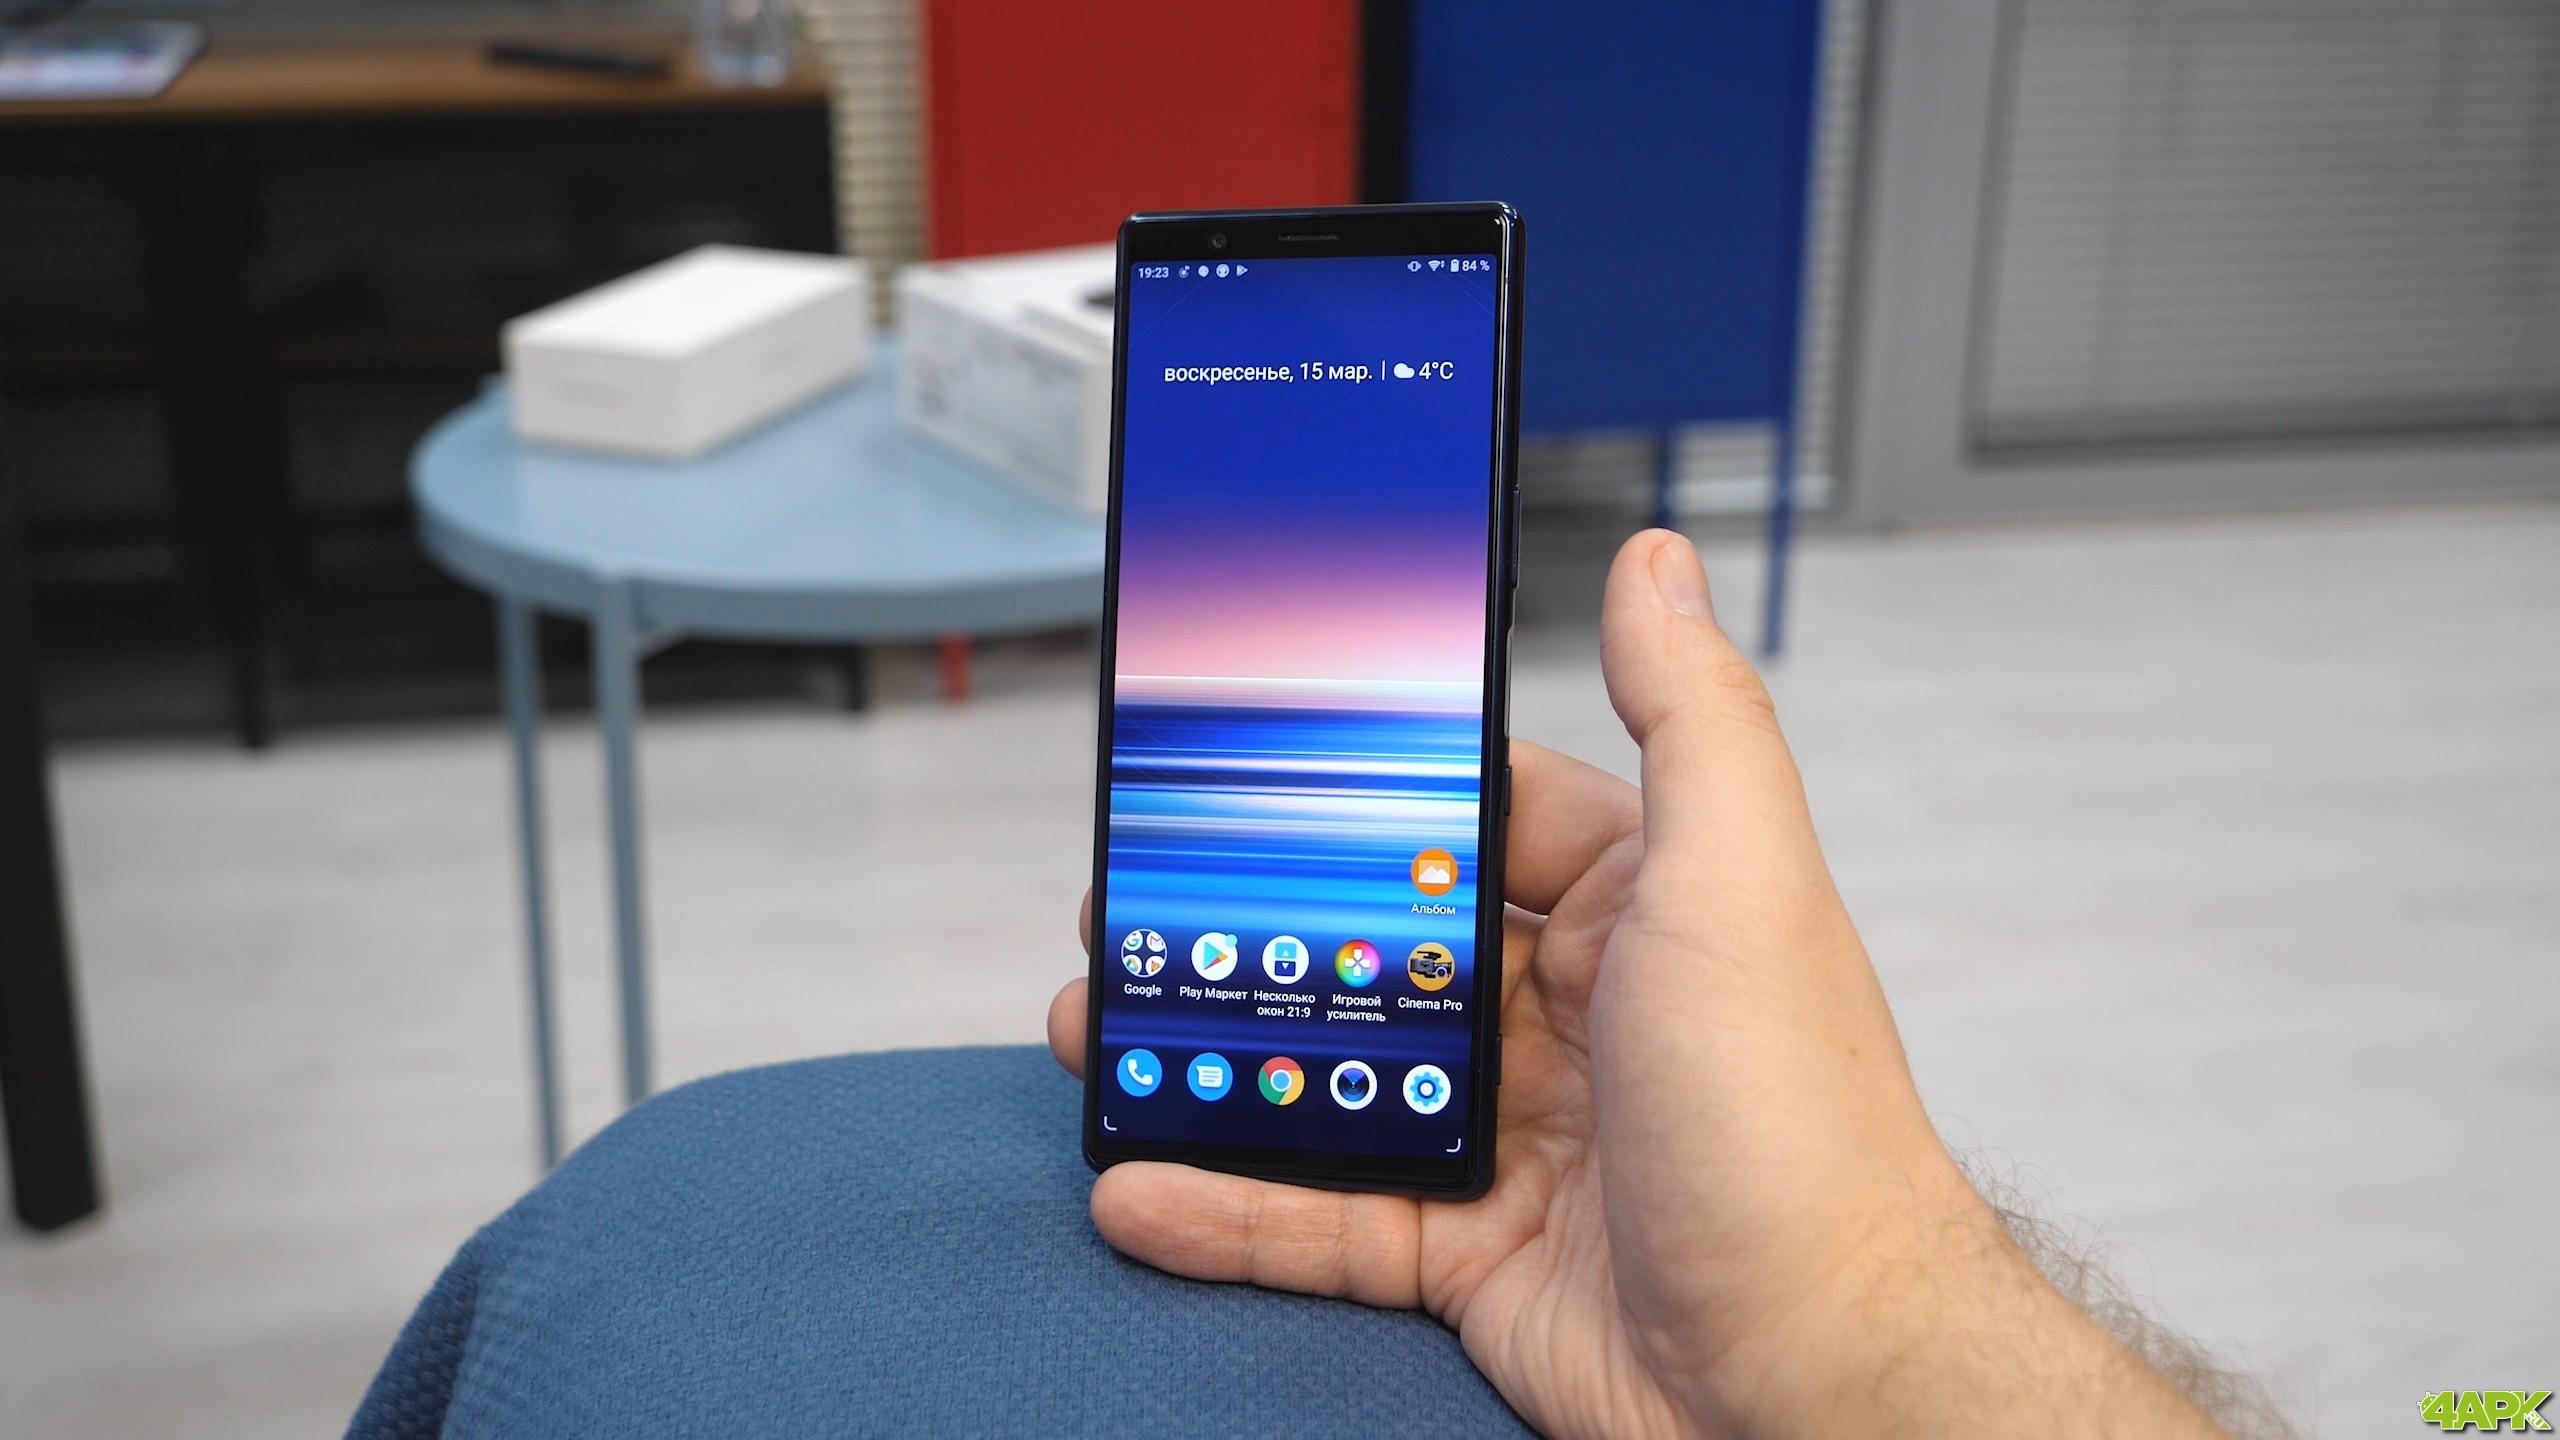 Обзор Sony Xperia 5: компактный смартфон с большим экраном Другие устройства  - obzor_sony_xperia_5_kompakt_s_bolshim_ekranom_picture40_0